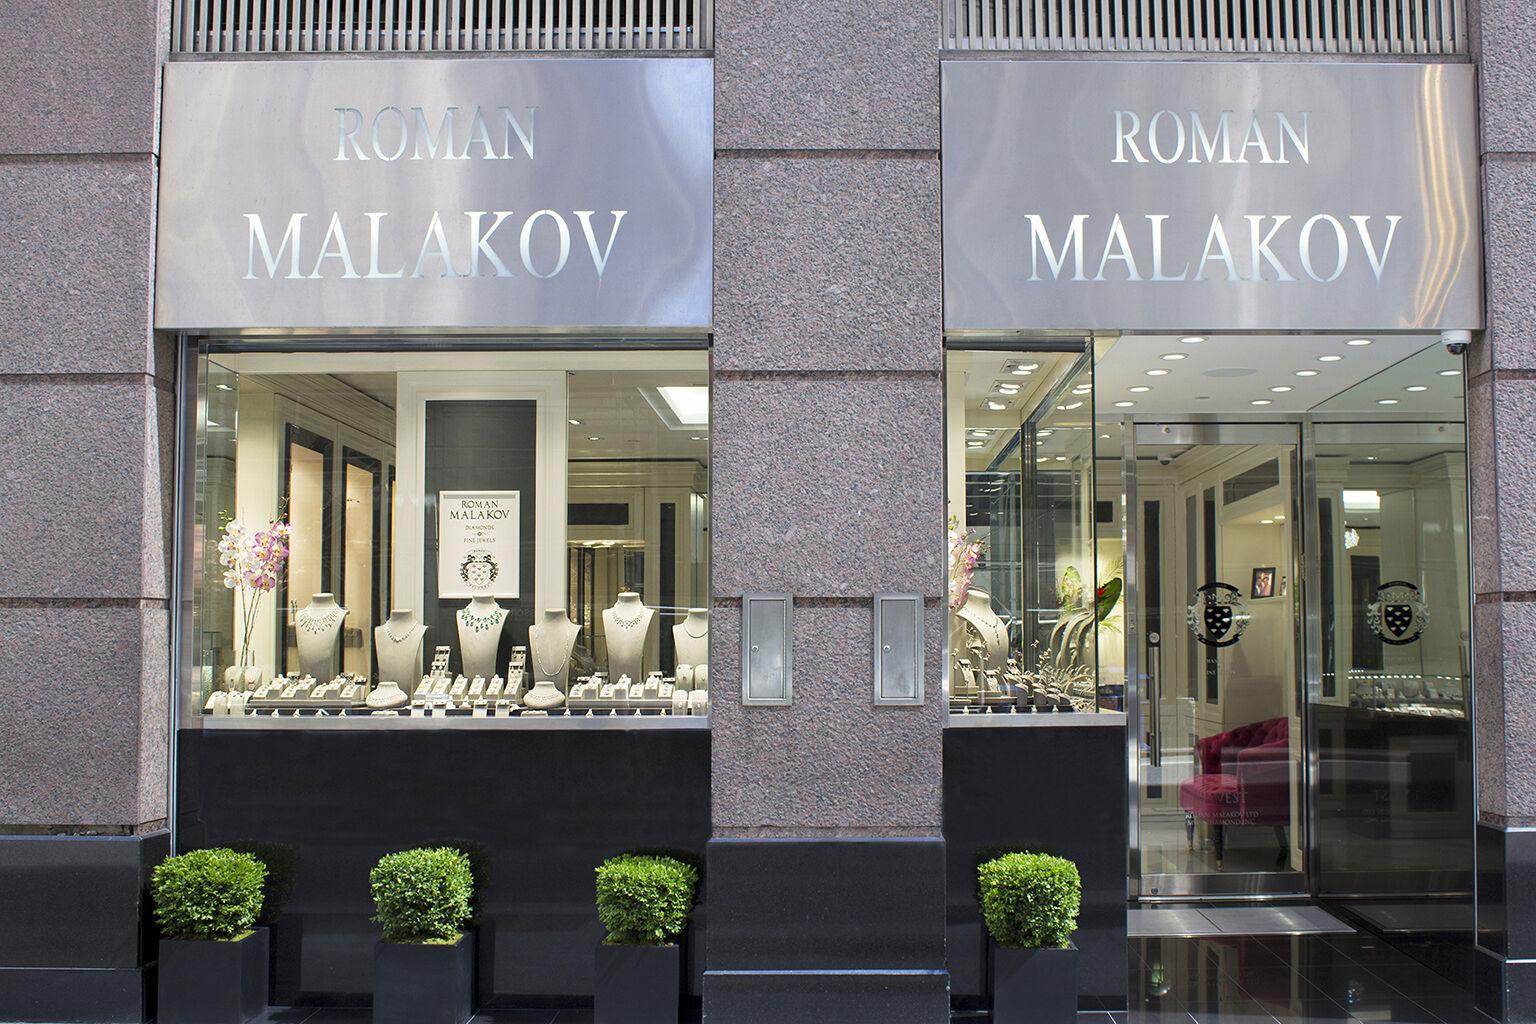 Roman Malakov Storefront